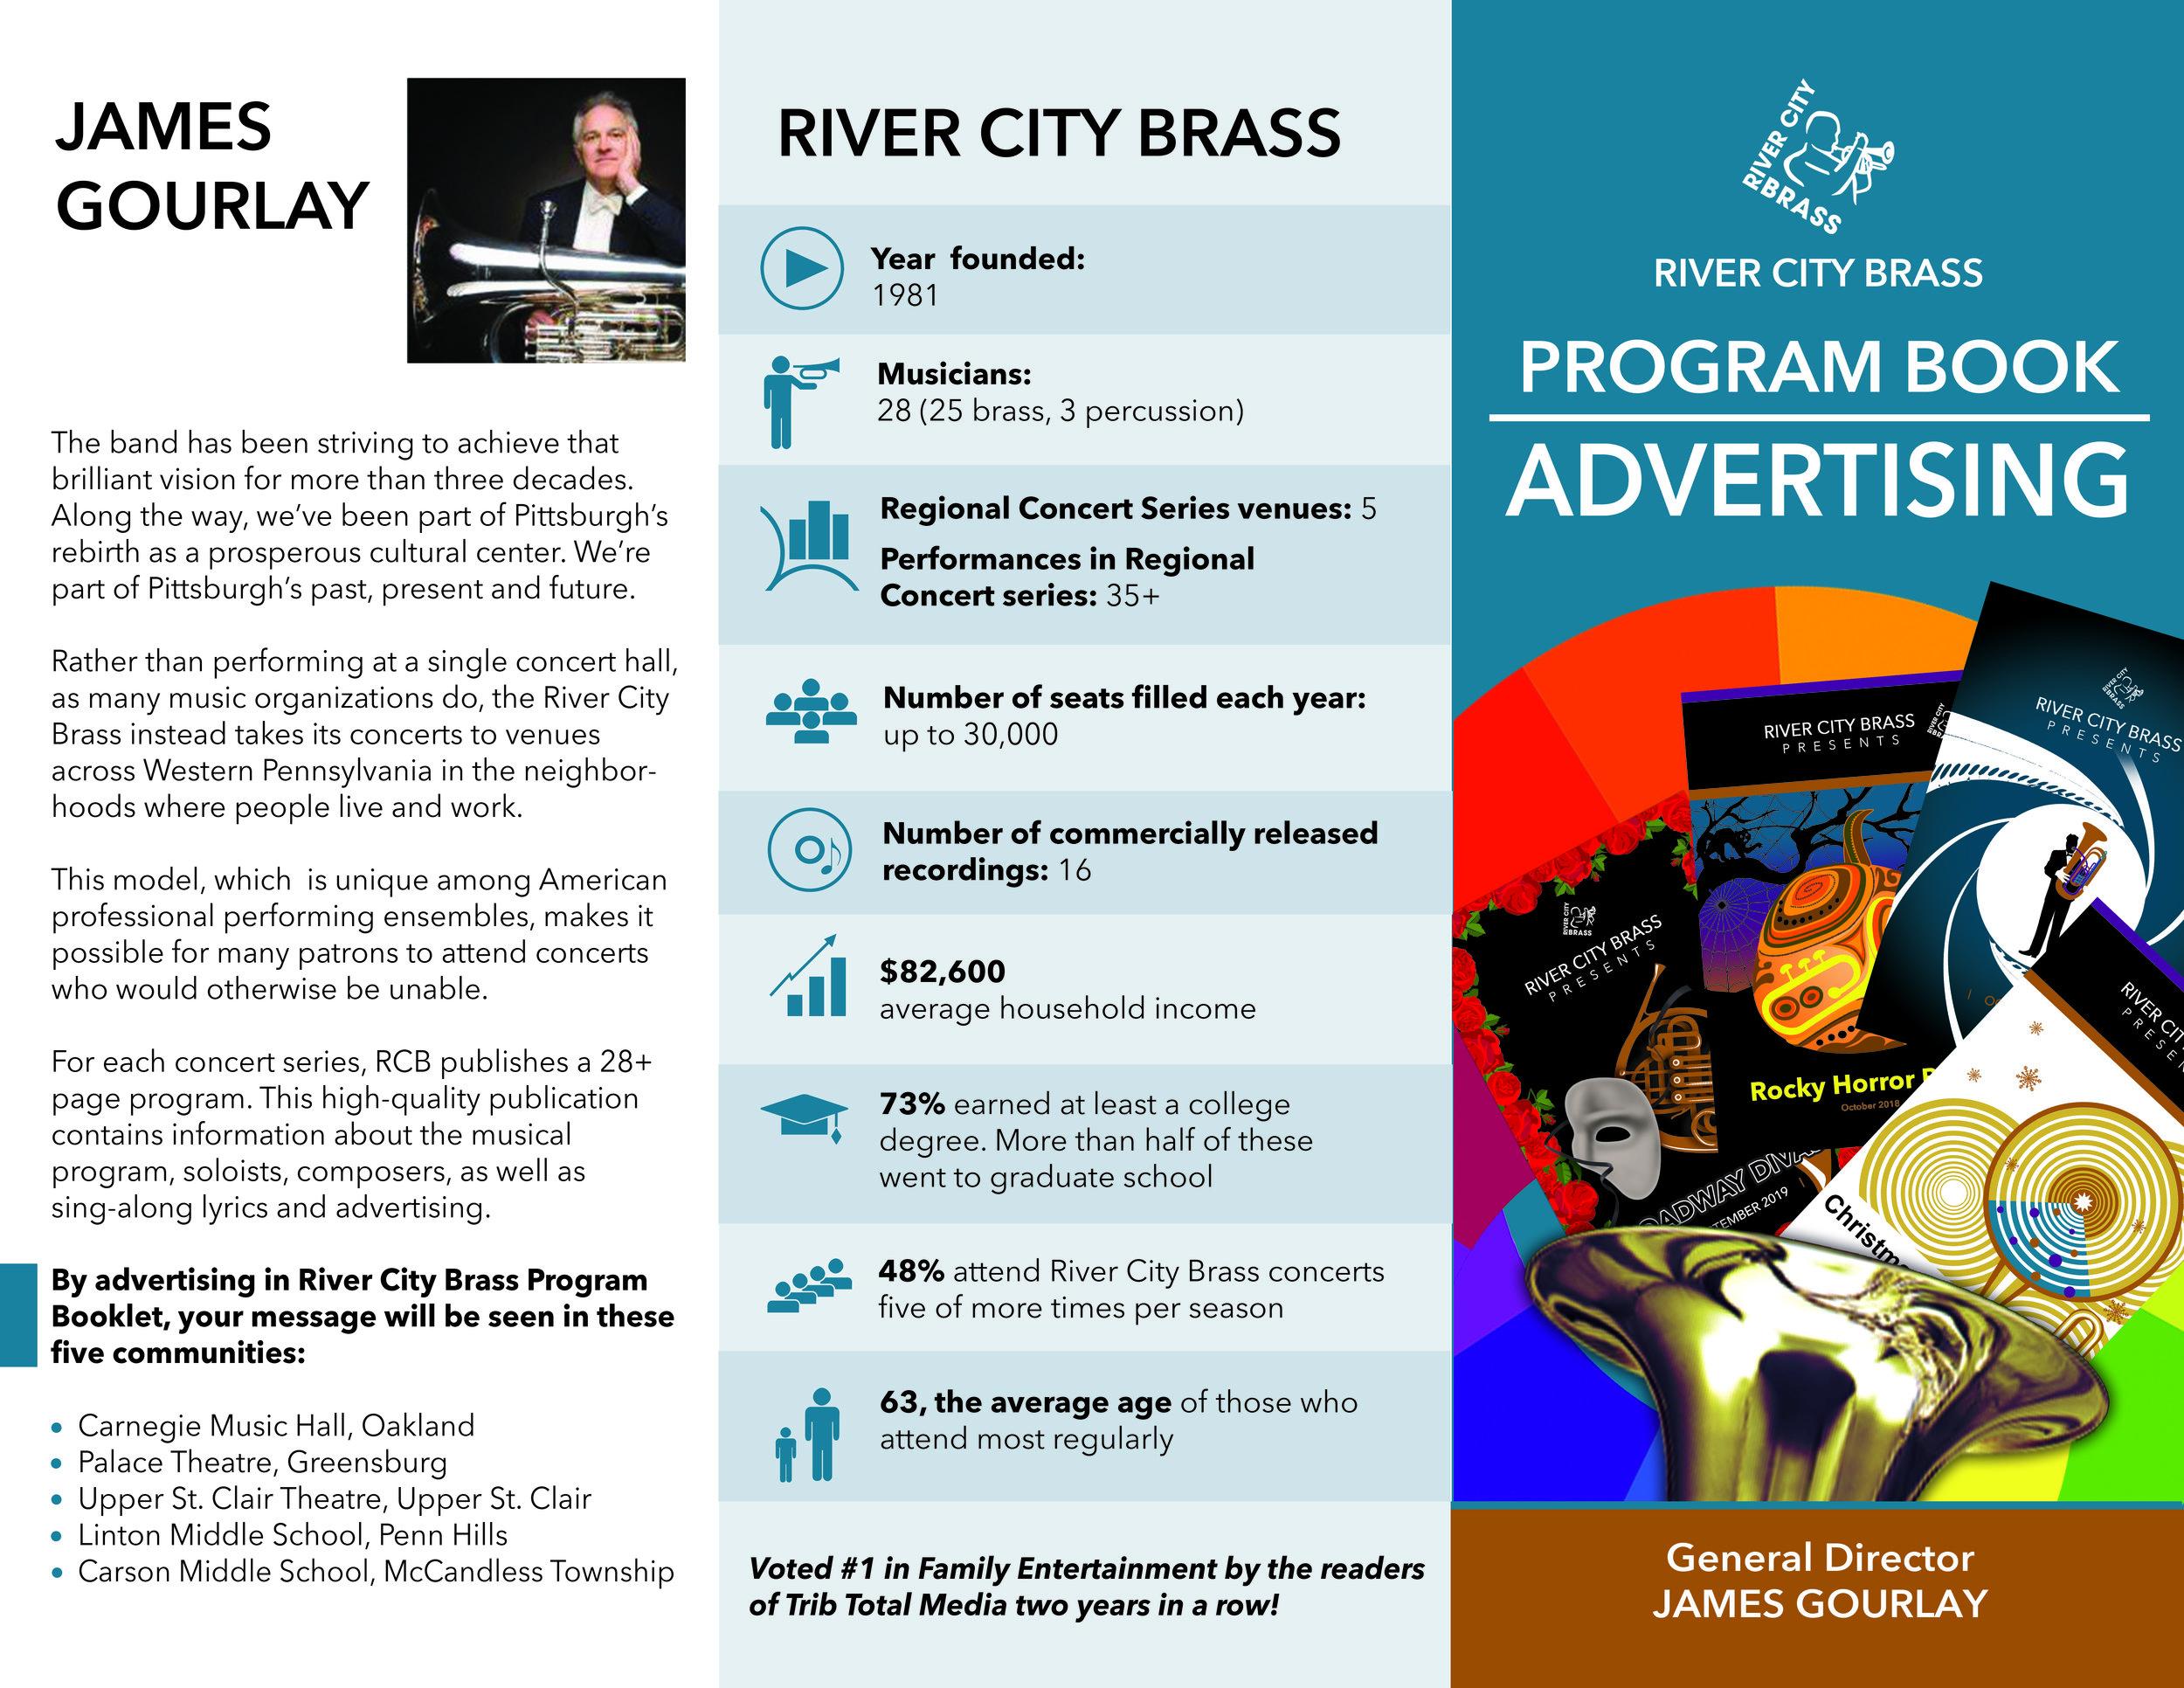 Program Book Adv Brochure19-20.jpg